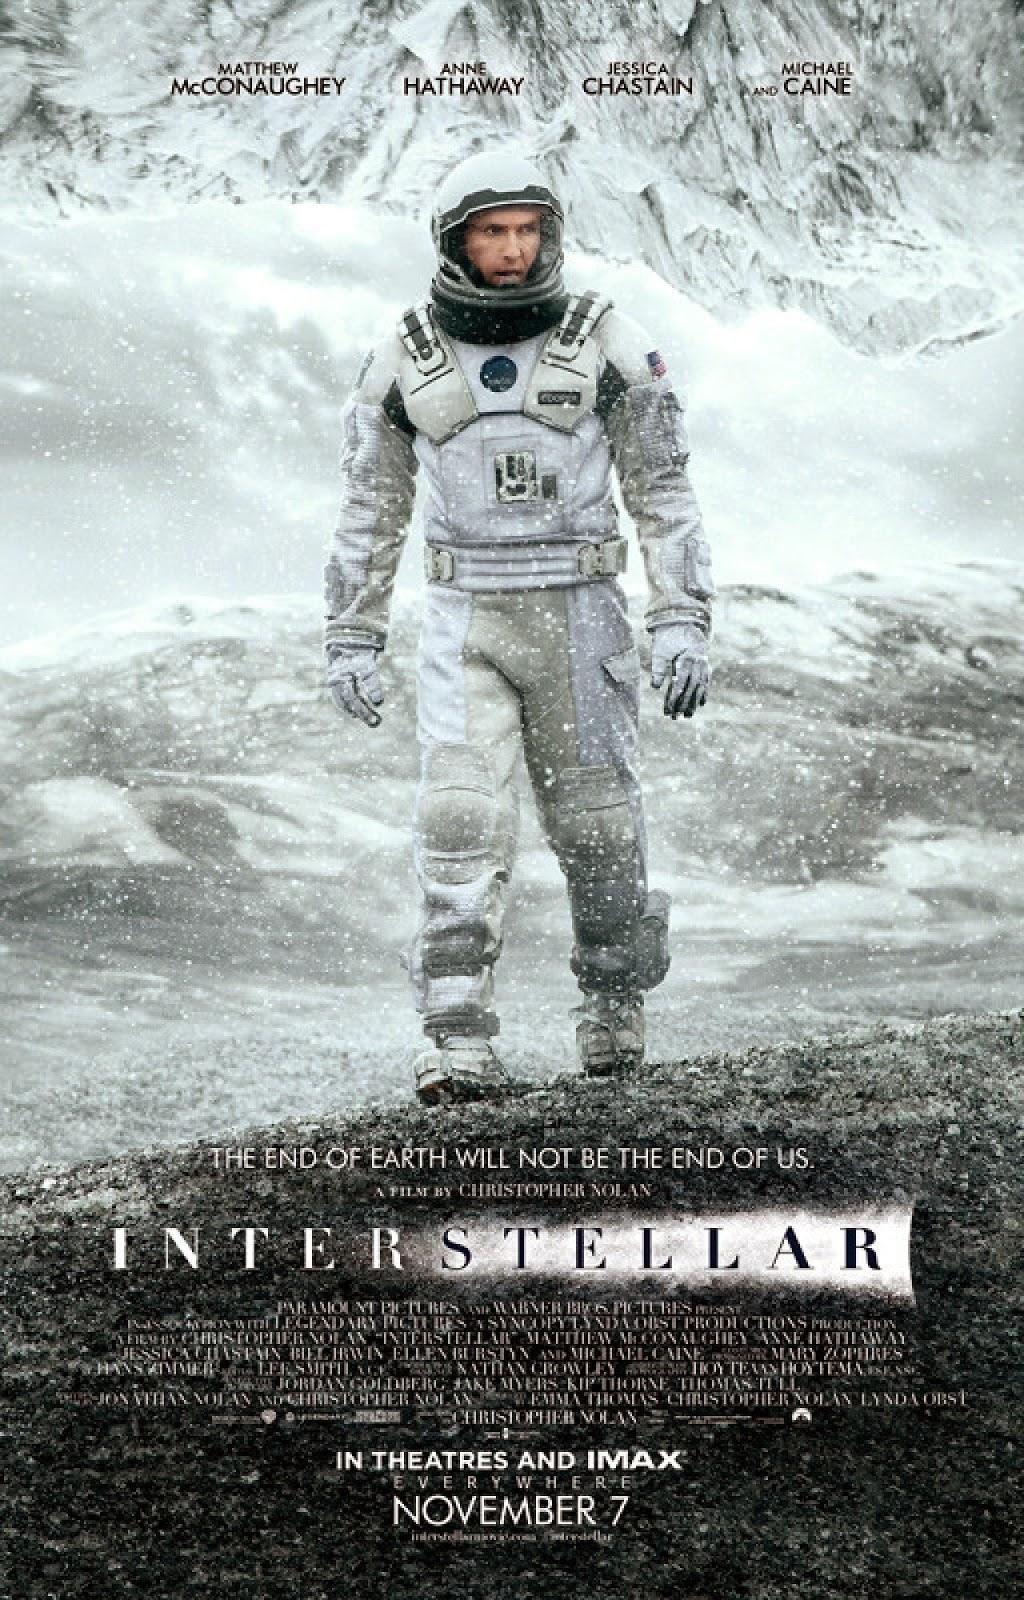 Interstellar Ver gratis online en vivo streaming sin descarga ni torrent